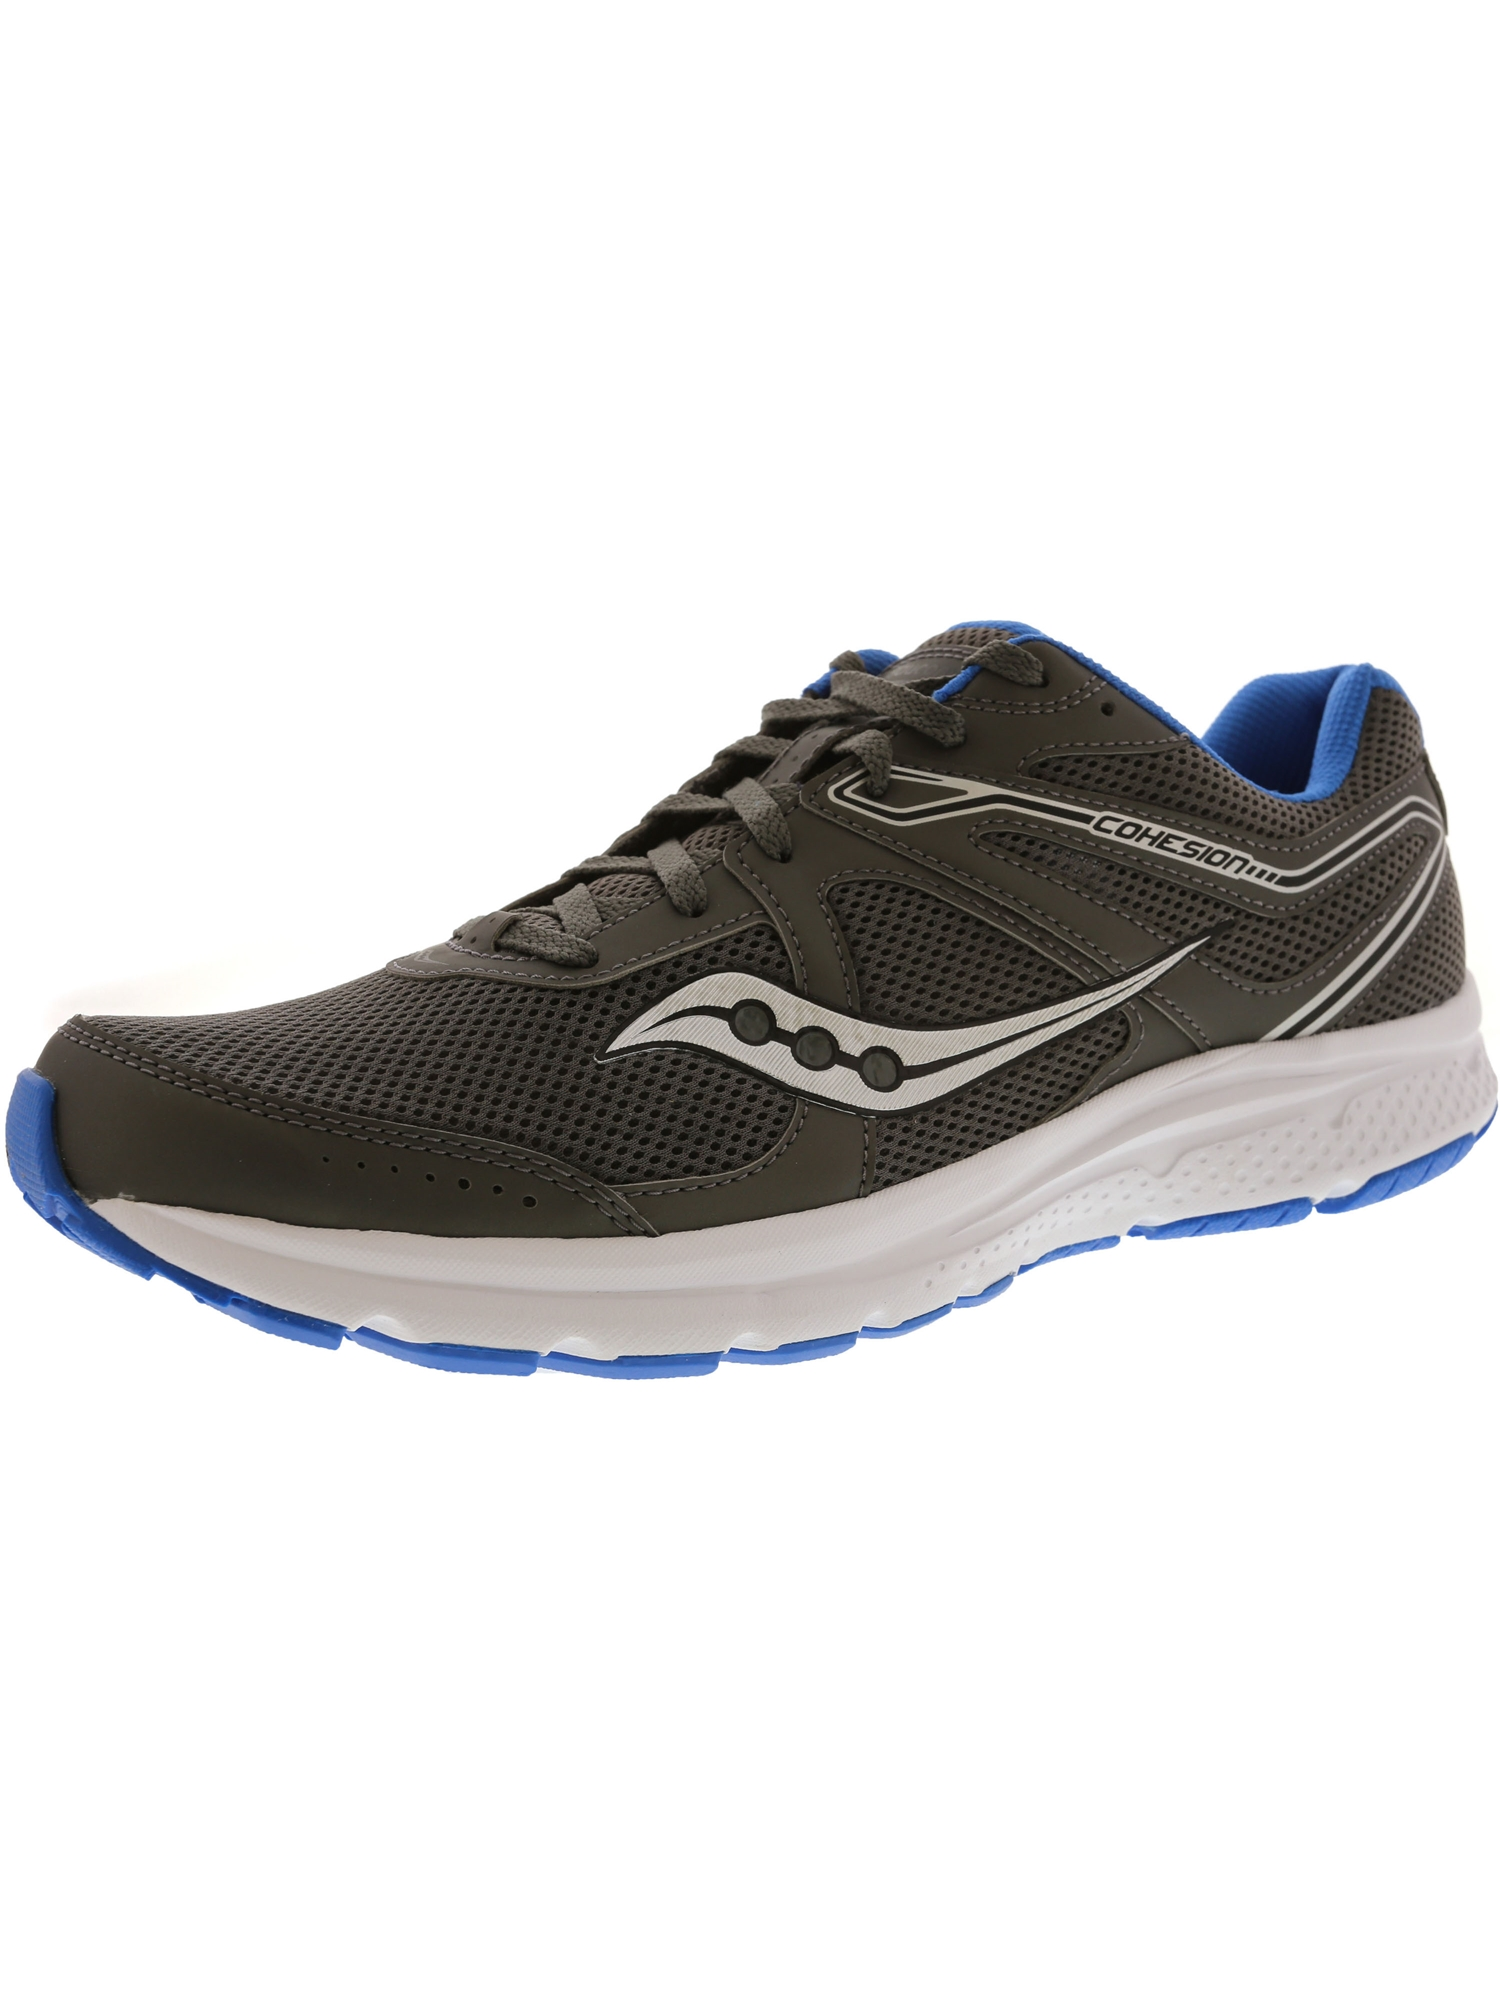 Saucony Men's Grid Cohesion 11 Silver / Orange Ankle-High Mesh Running Shoe - 10.5M